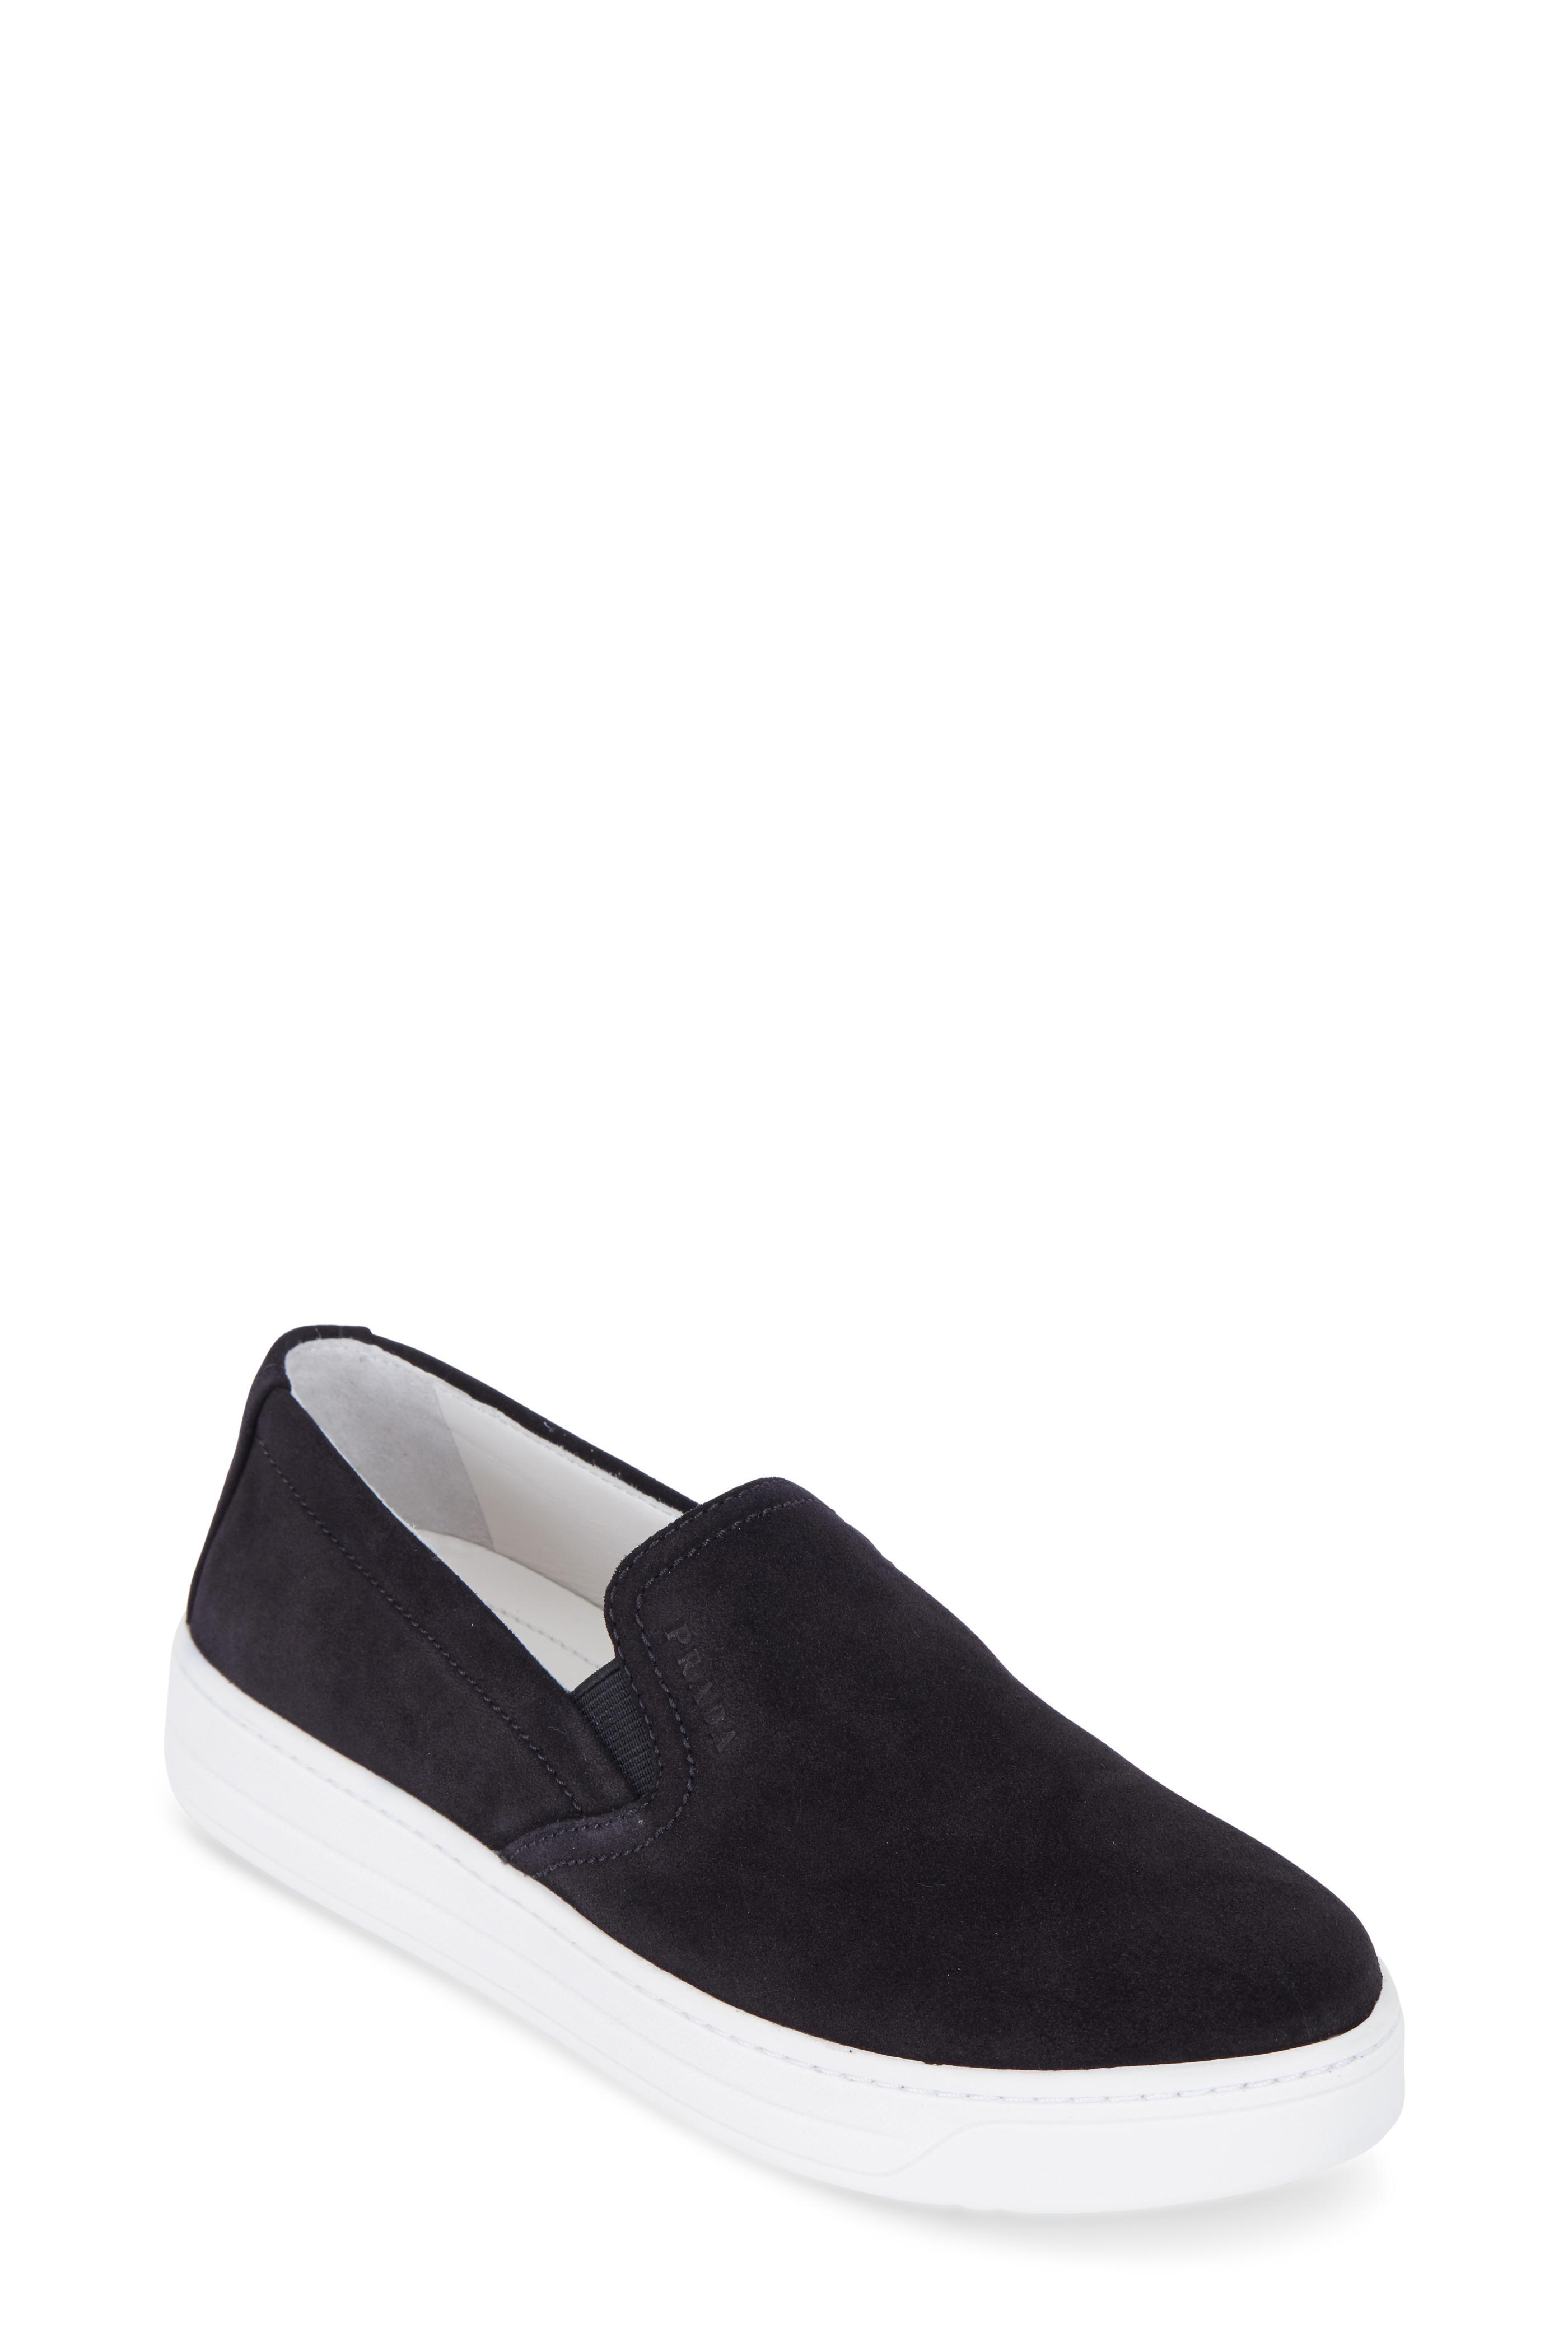 Prada Black Suede Slip On Skate Sneaker | Mitchell Stores